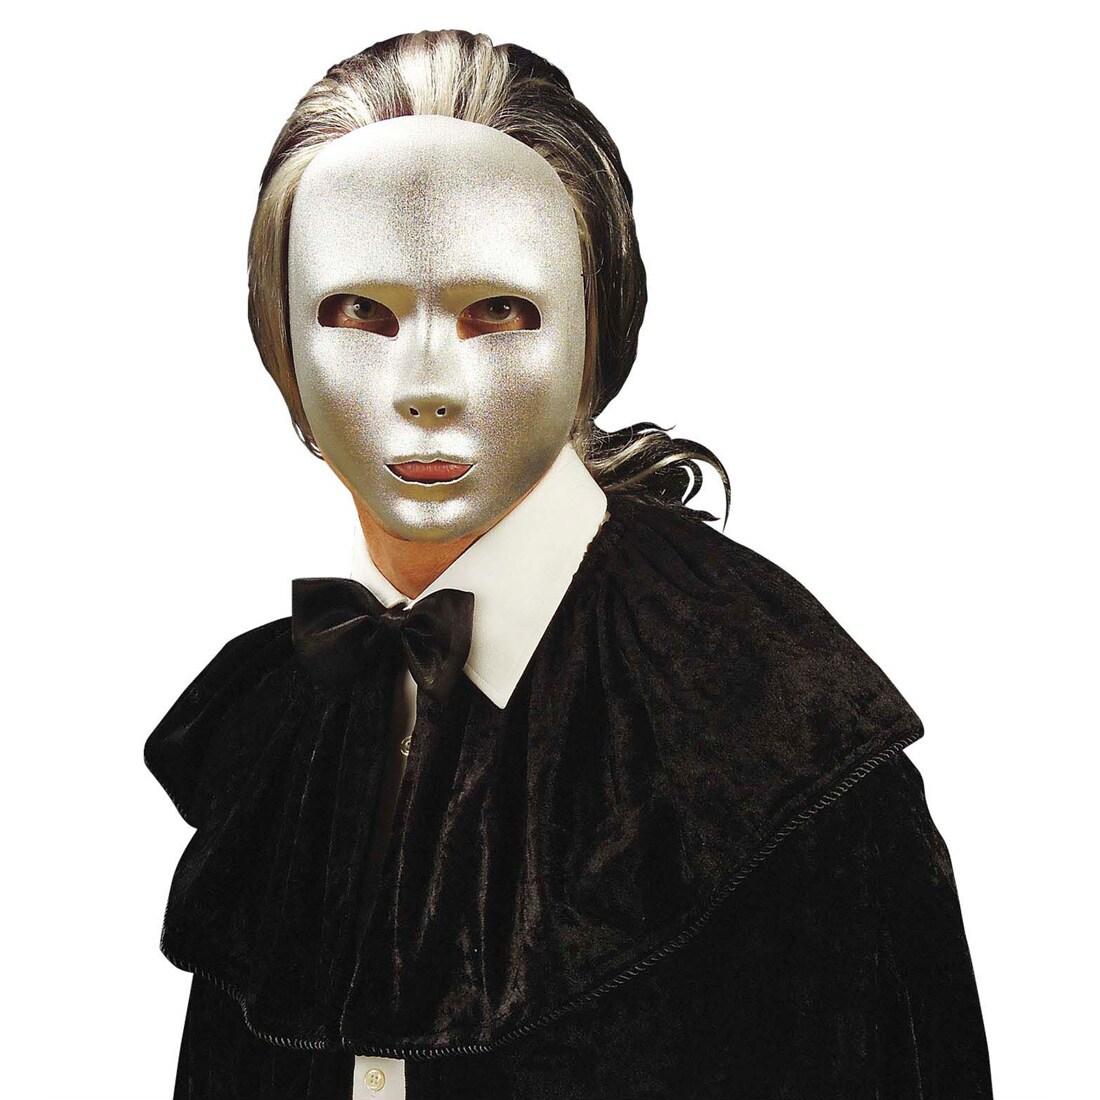 Phantommaske silber Theater Maske Fasching Phantom, 5,99